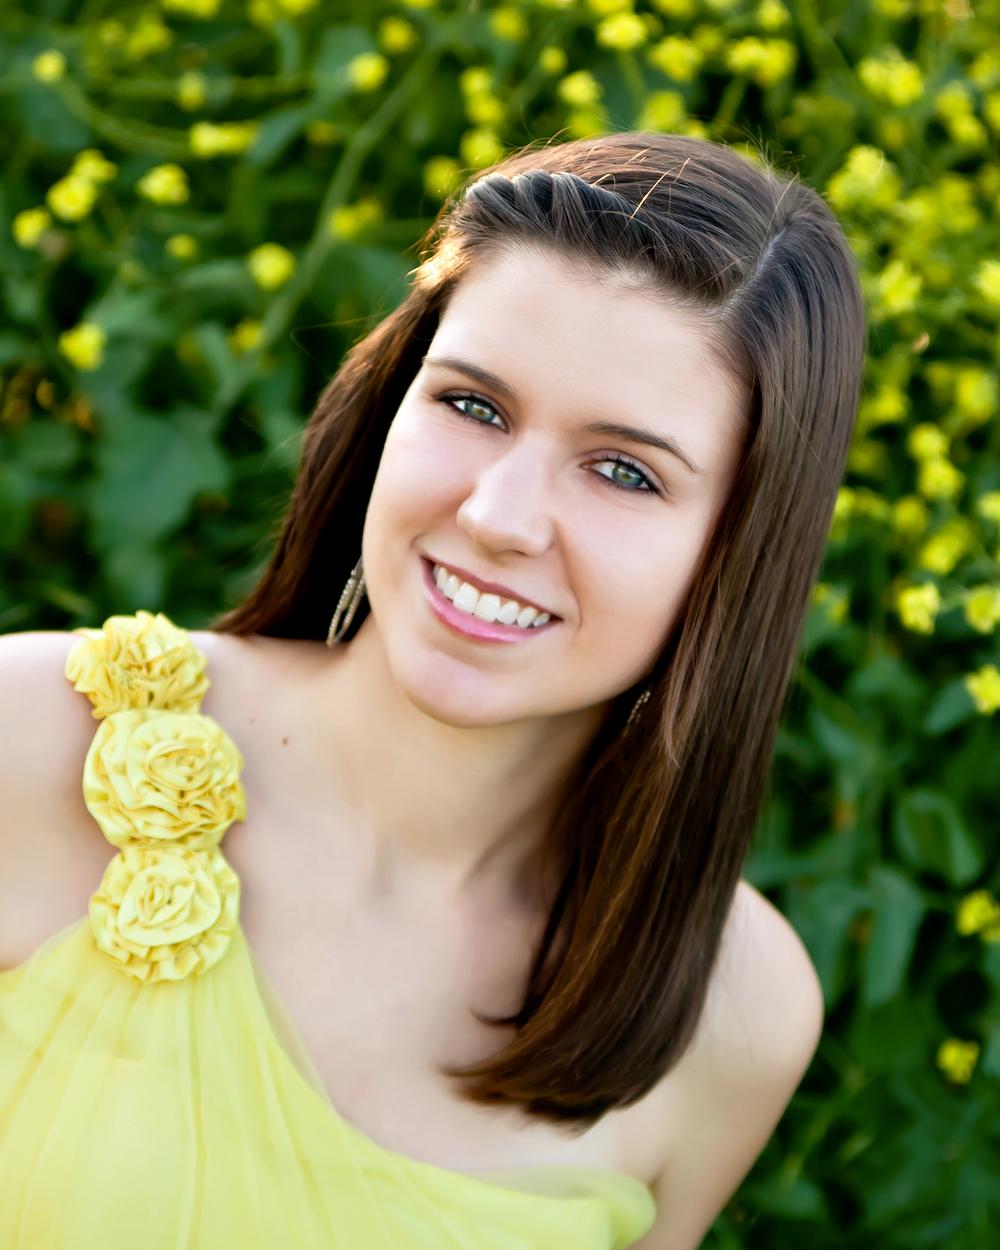 Rachel - 2012 attends Texas State University